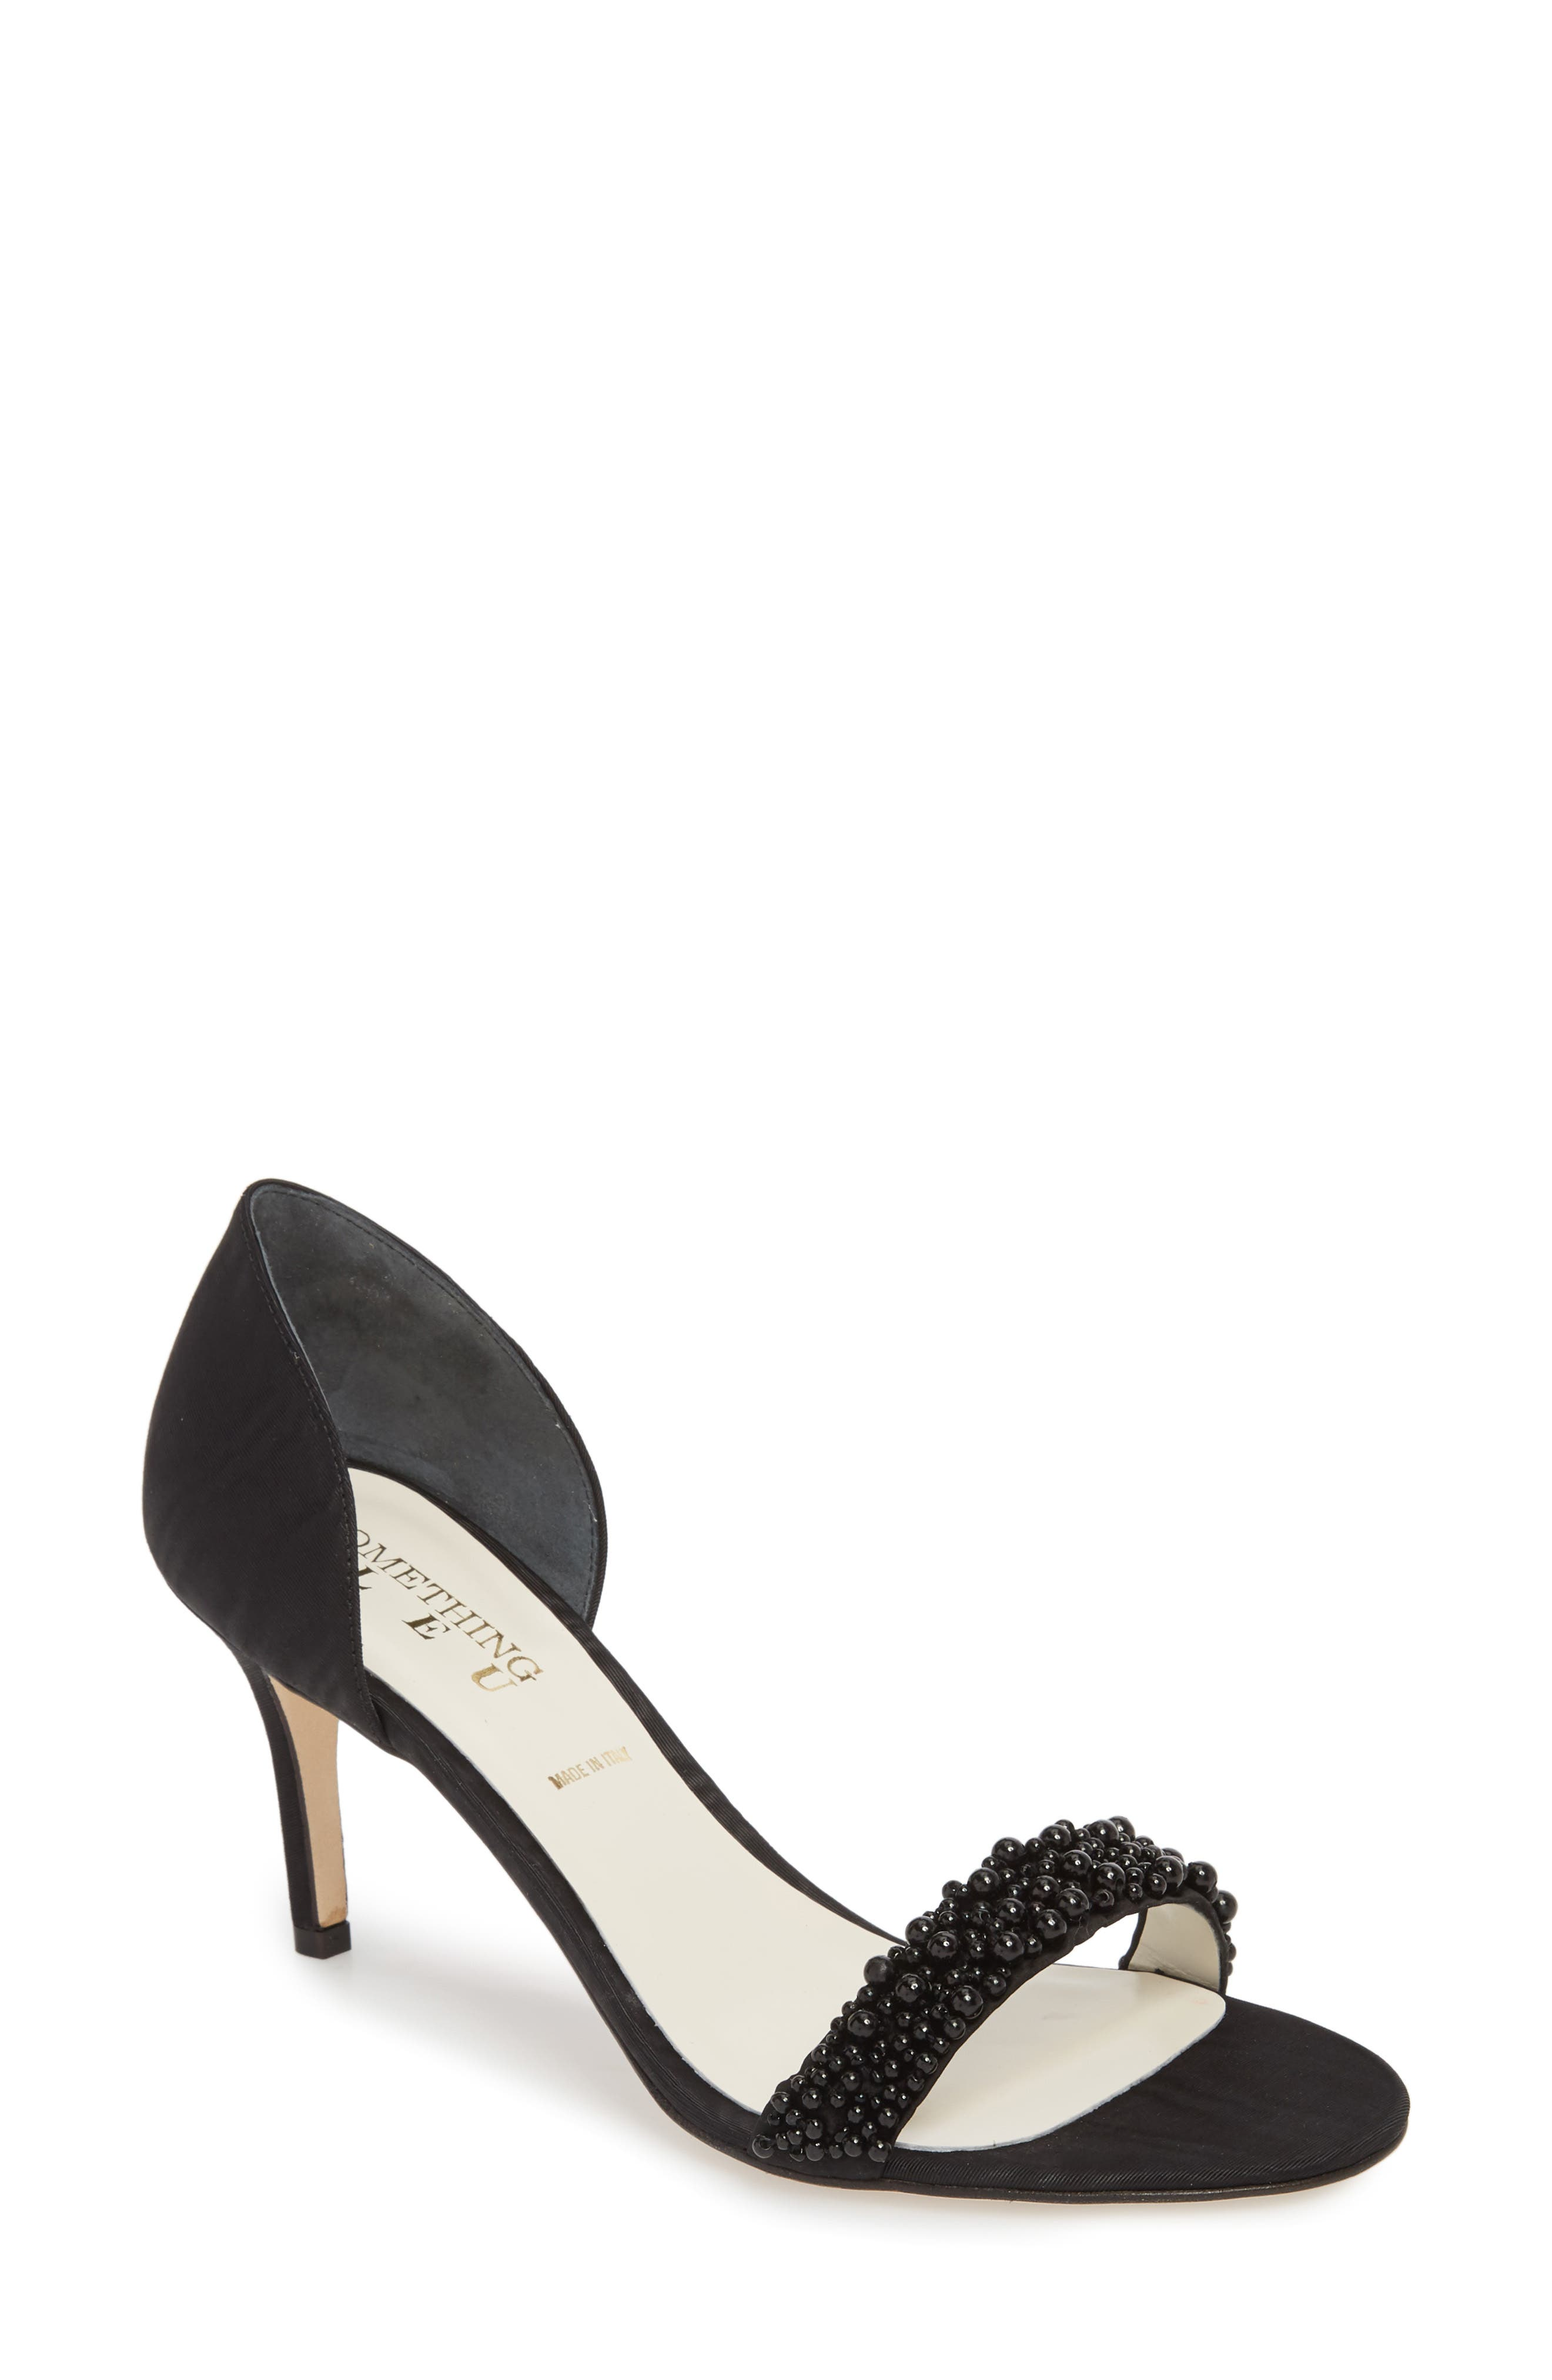 SOMETHING BLEU Cappy d'Orsay Sandal, Main, color, BLACK MOIRE